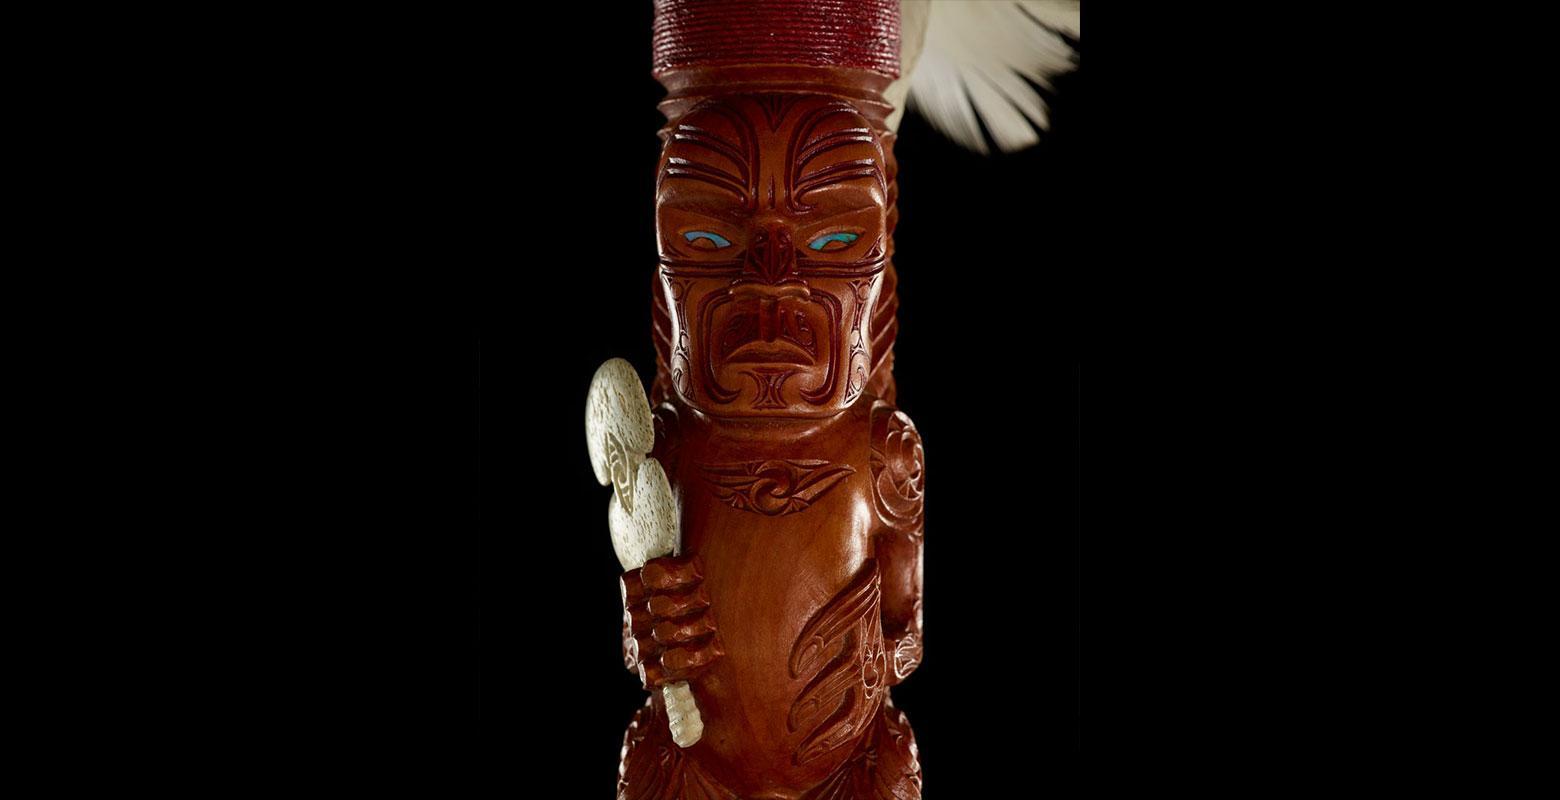 Detail from pūkāea (trumpet)